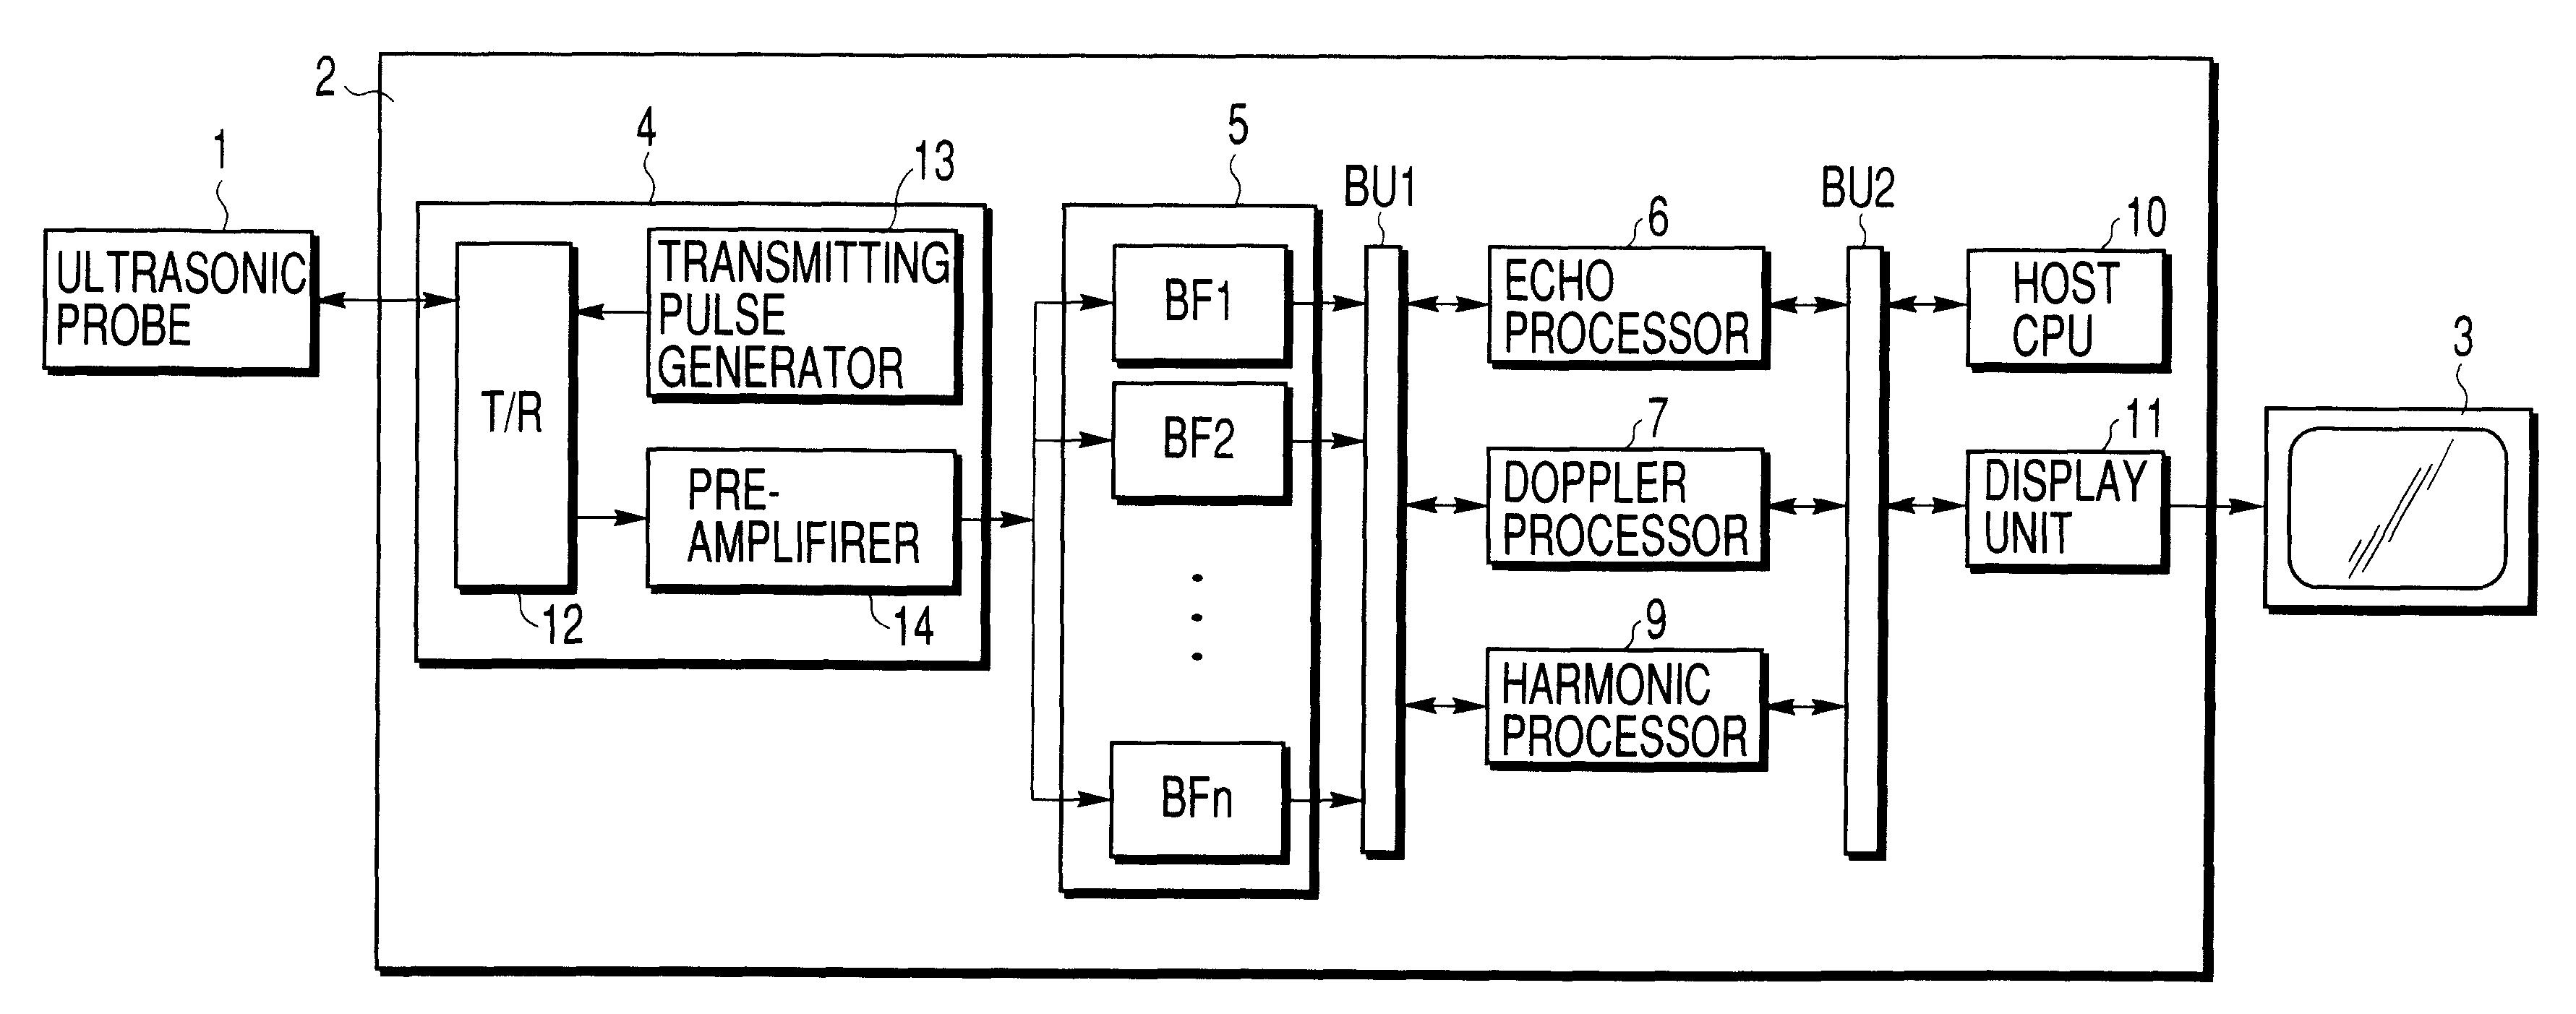 Patent US6506158 - Ultrasonic diagnosis apparatus - Google ... on alternator battery wiring connection, light wiring diagram, starter wiring diagram, turbo wiring diagram, fuse wiring diagram, engine wiring diagram, power wiring diagram, alternator battery cable,